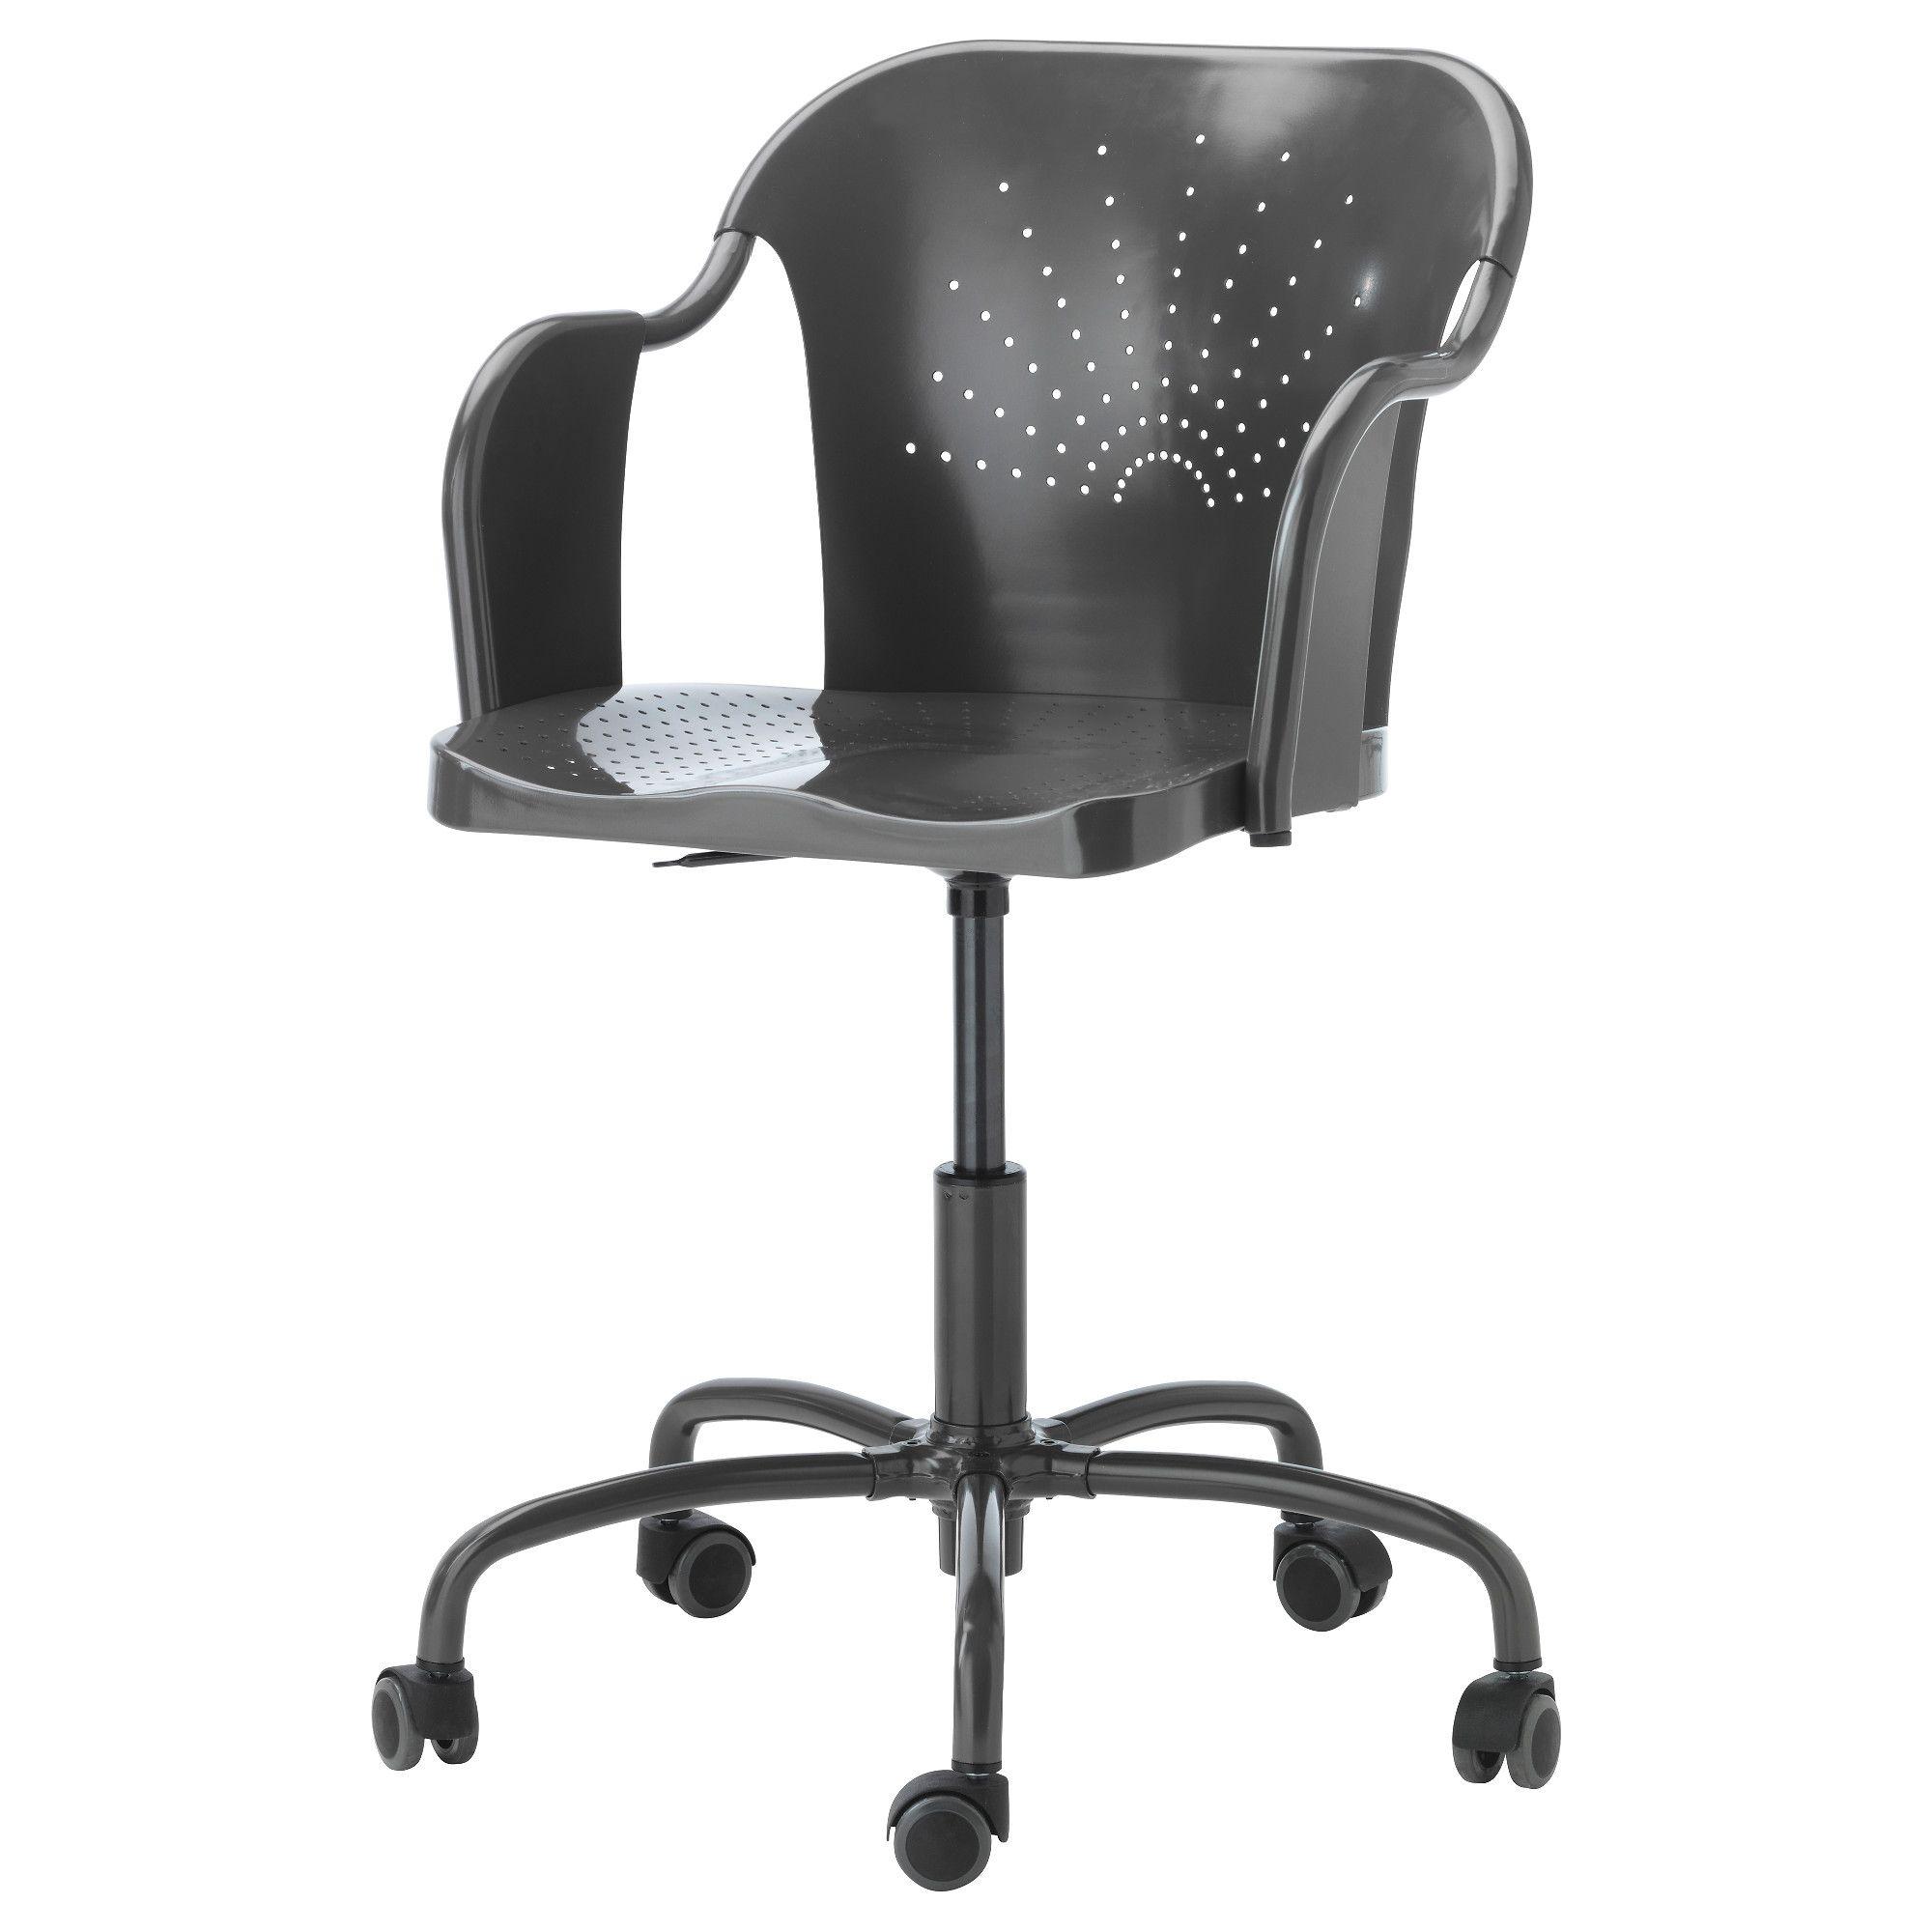 Ikea Us Furniture And Home Furnishings Ikea Office Chair Swivel Chair Ikea